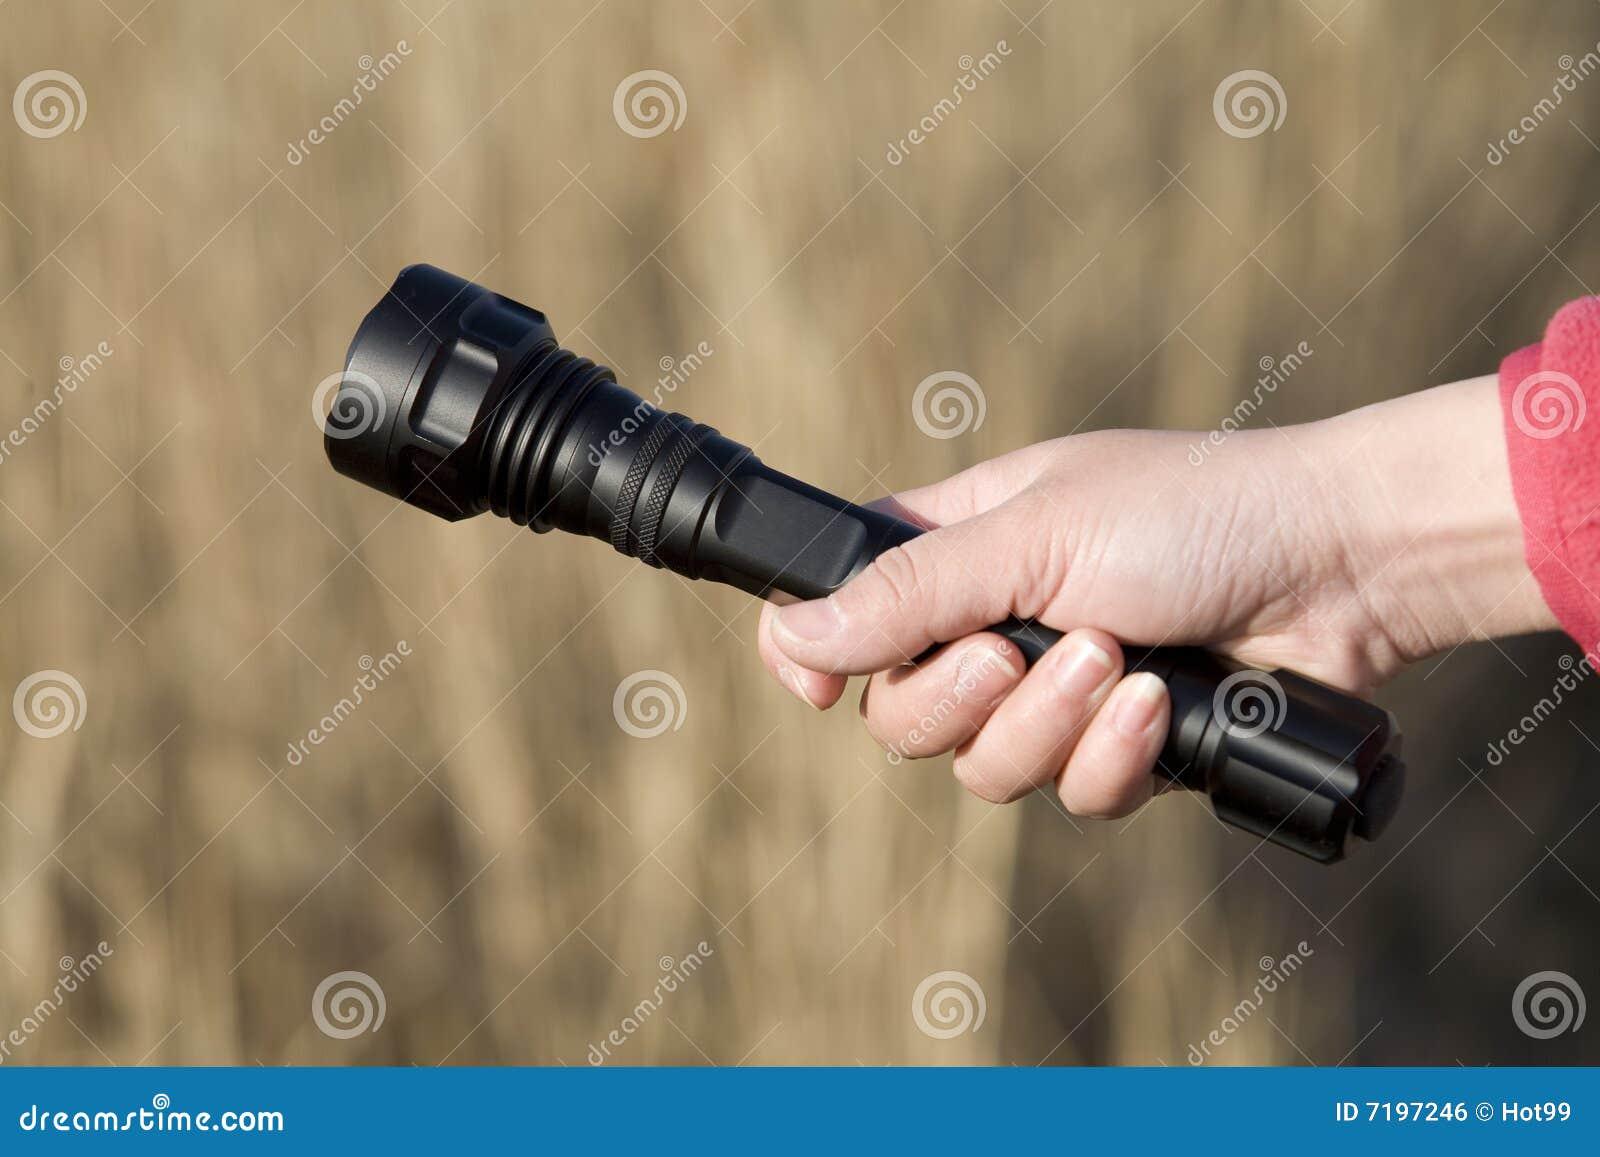 Hand holding a flashlight